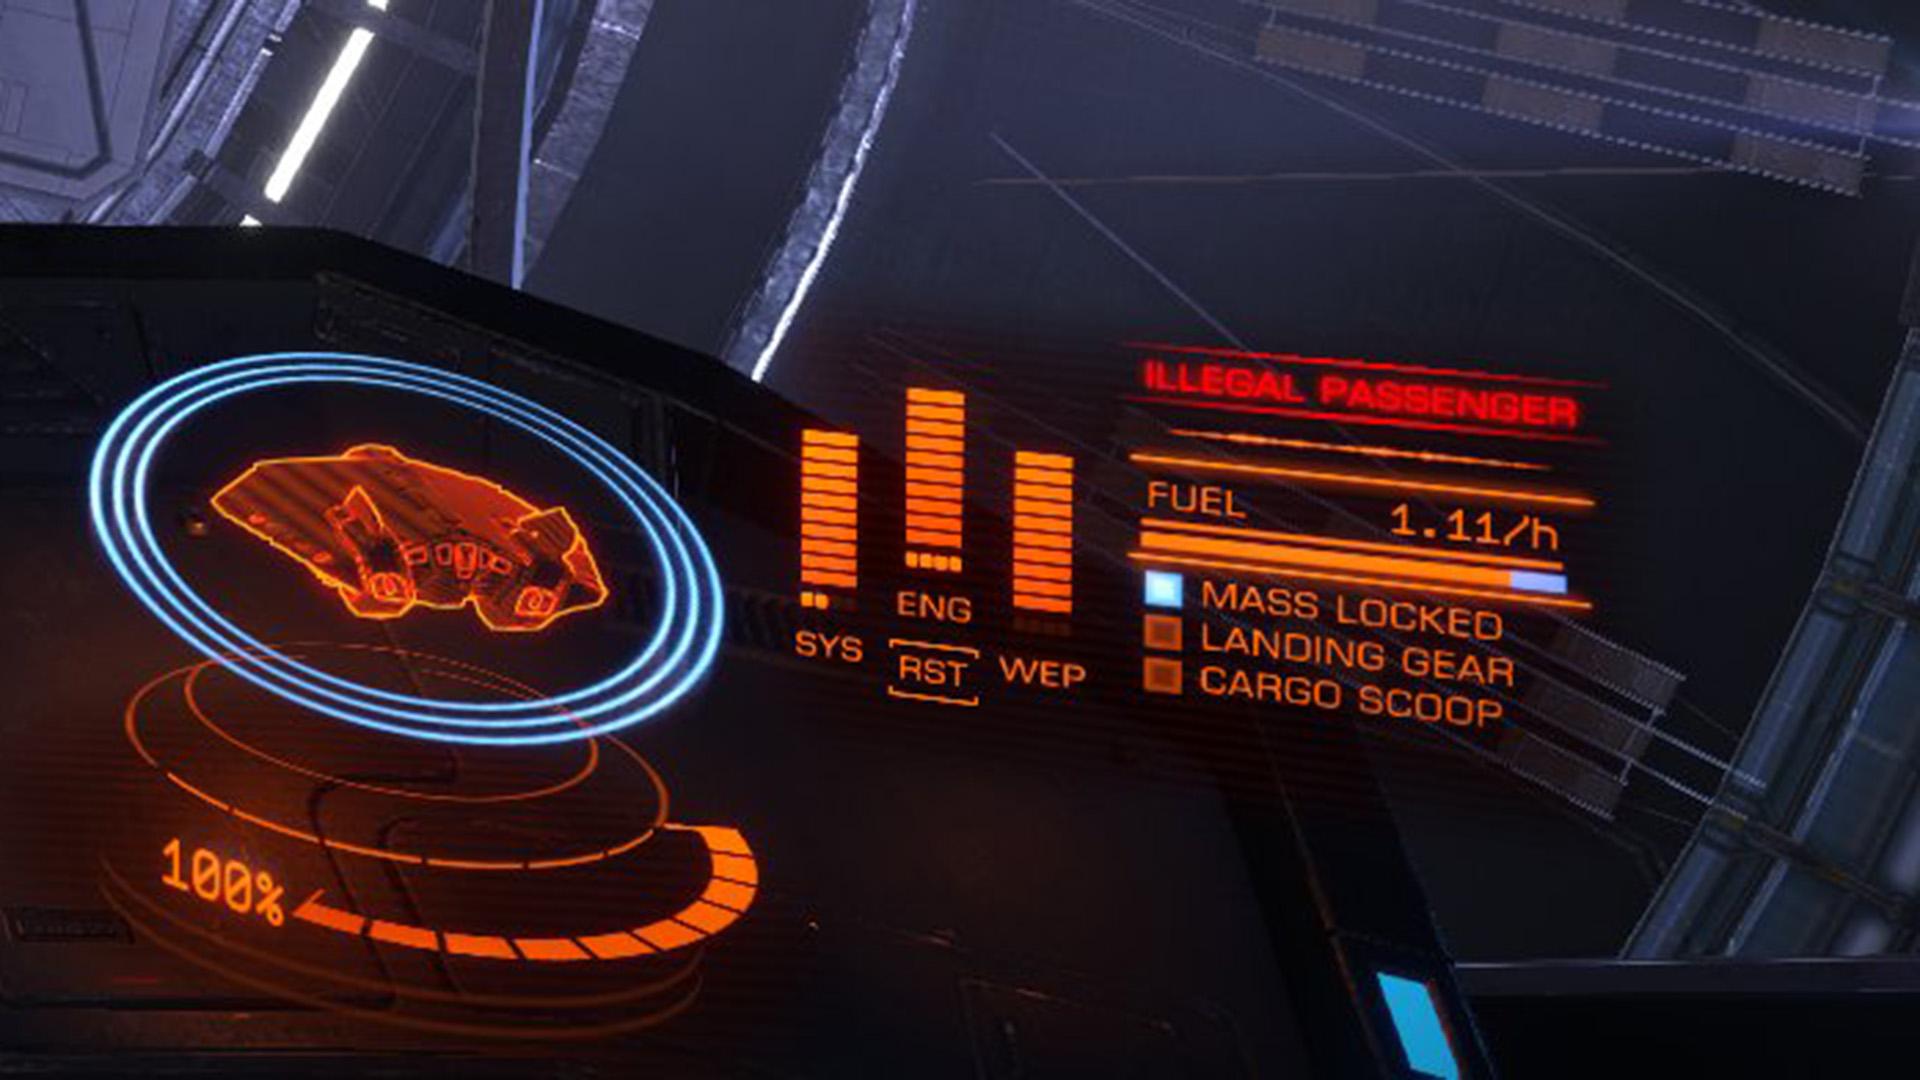 Elite: Dangerous beginner's guide: a screenshot showing the illegal passenger warning